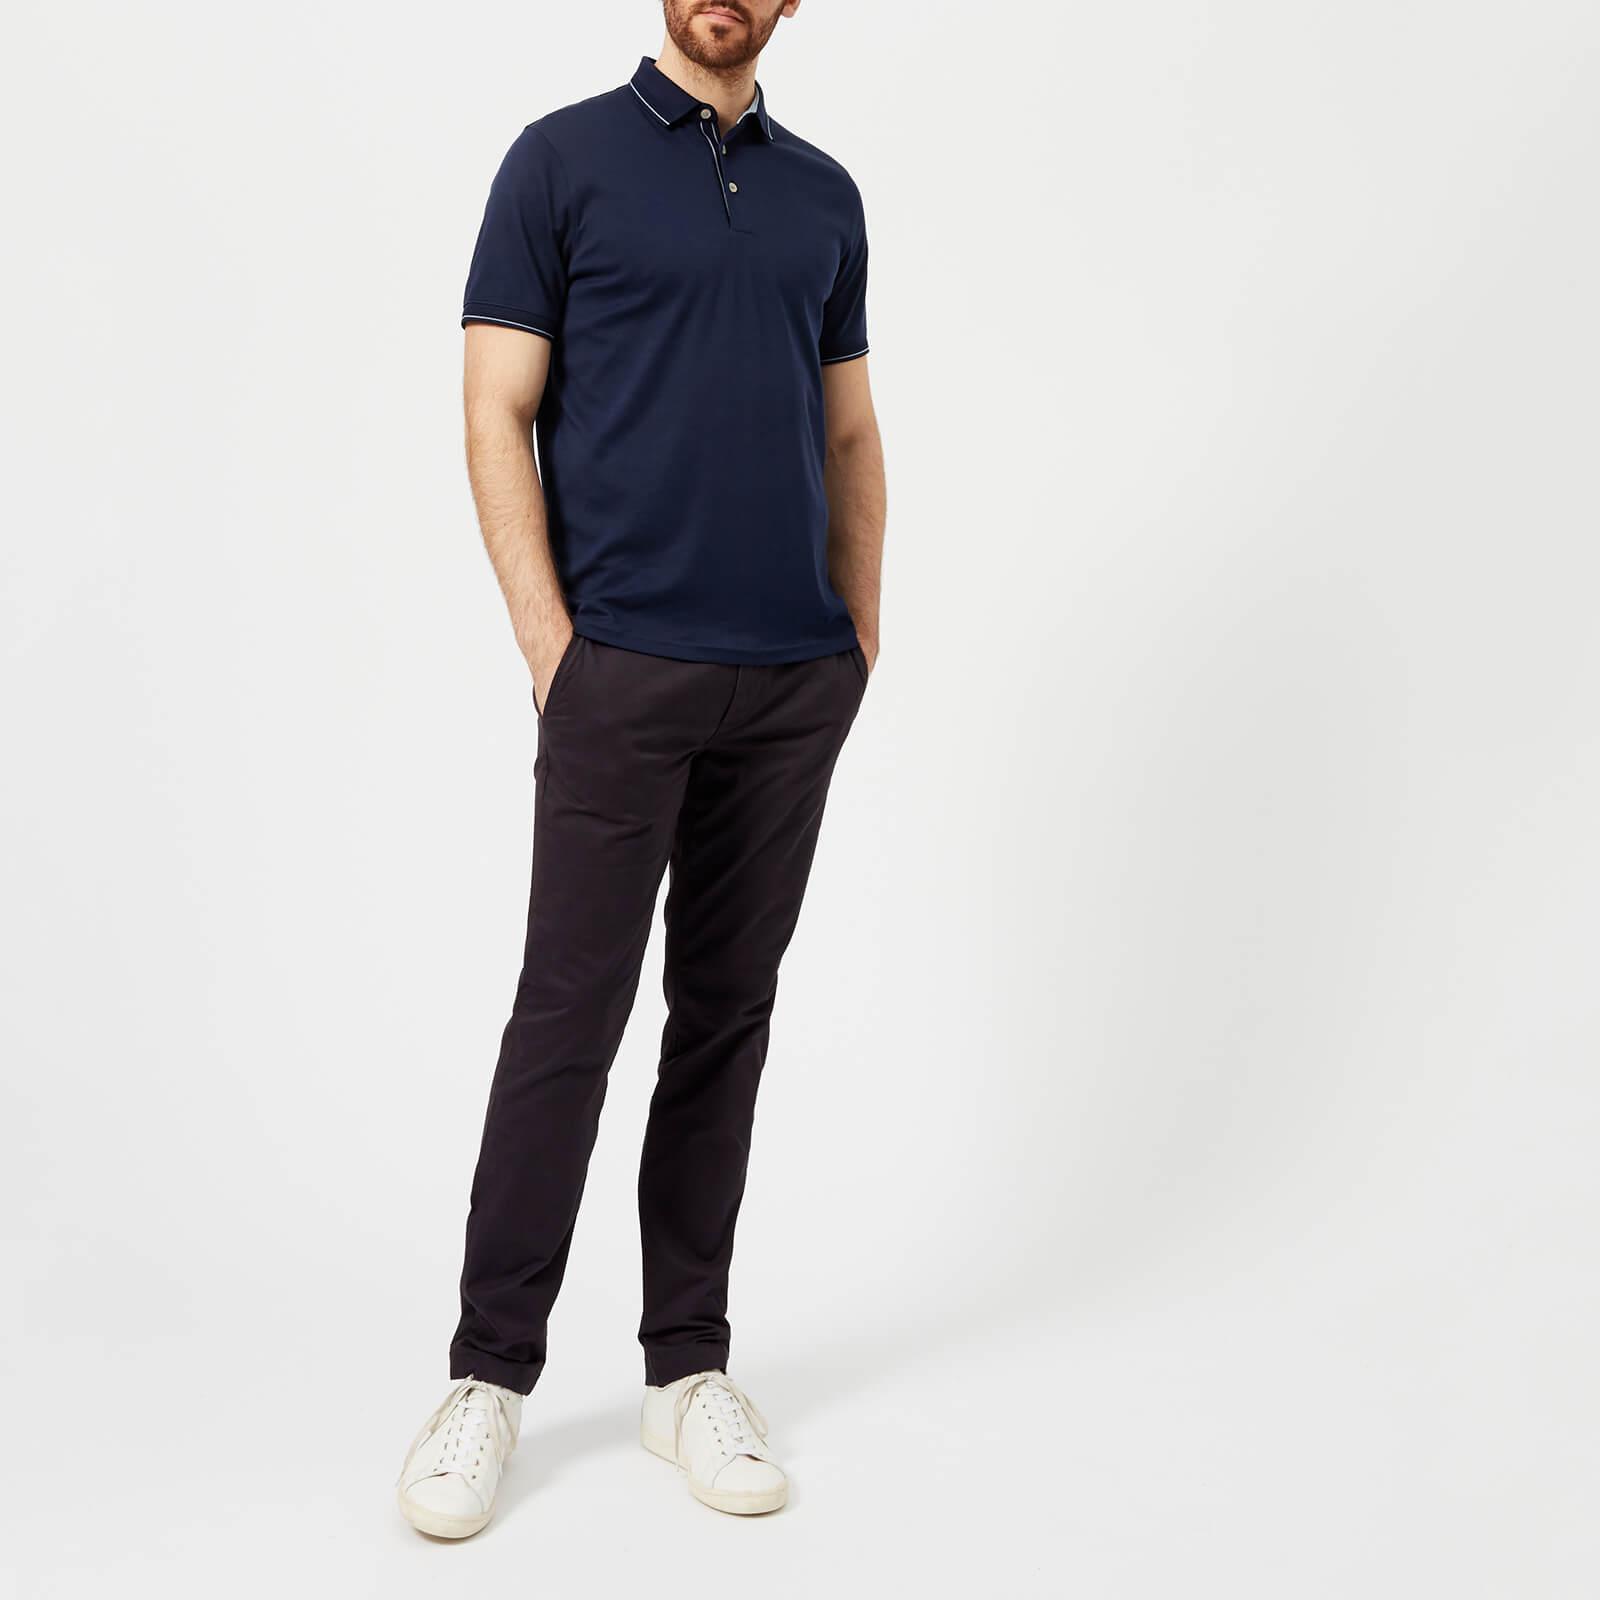 Ted Baker Cotton Pug Stripe Detail Polo Shirt in Navy (Blue) for Men